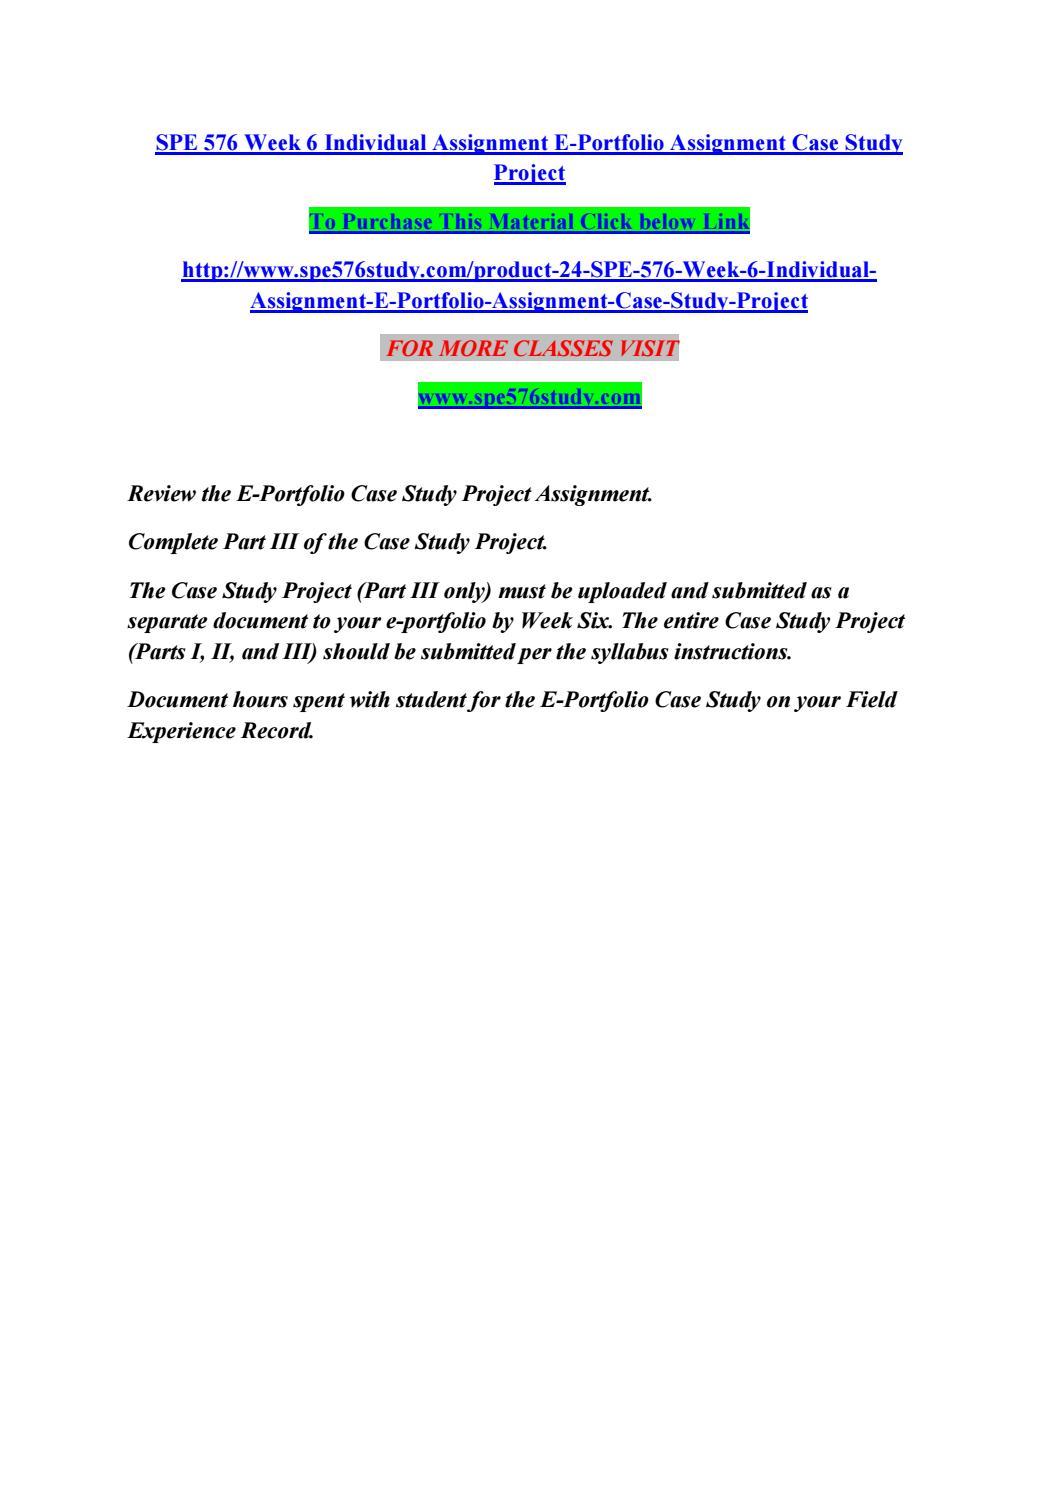 Case assignment 6